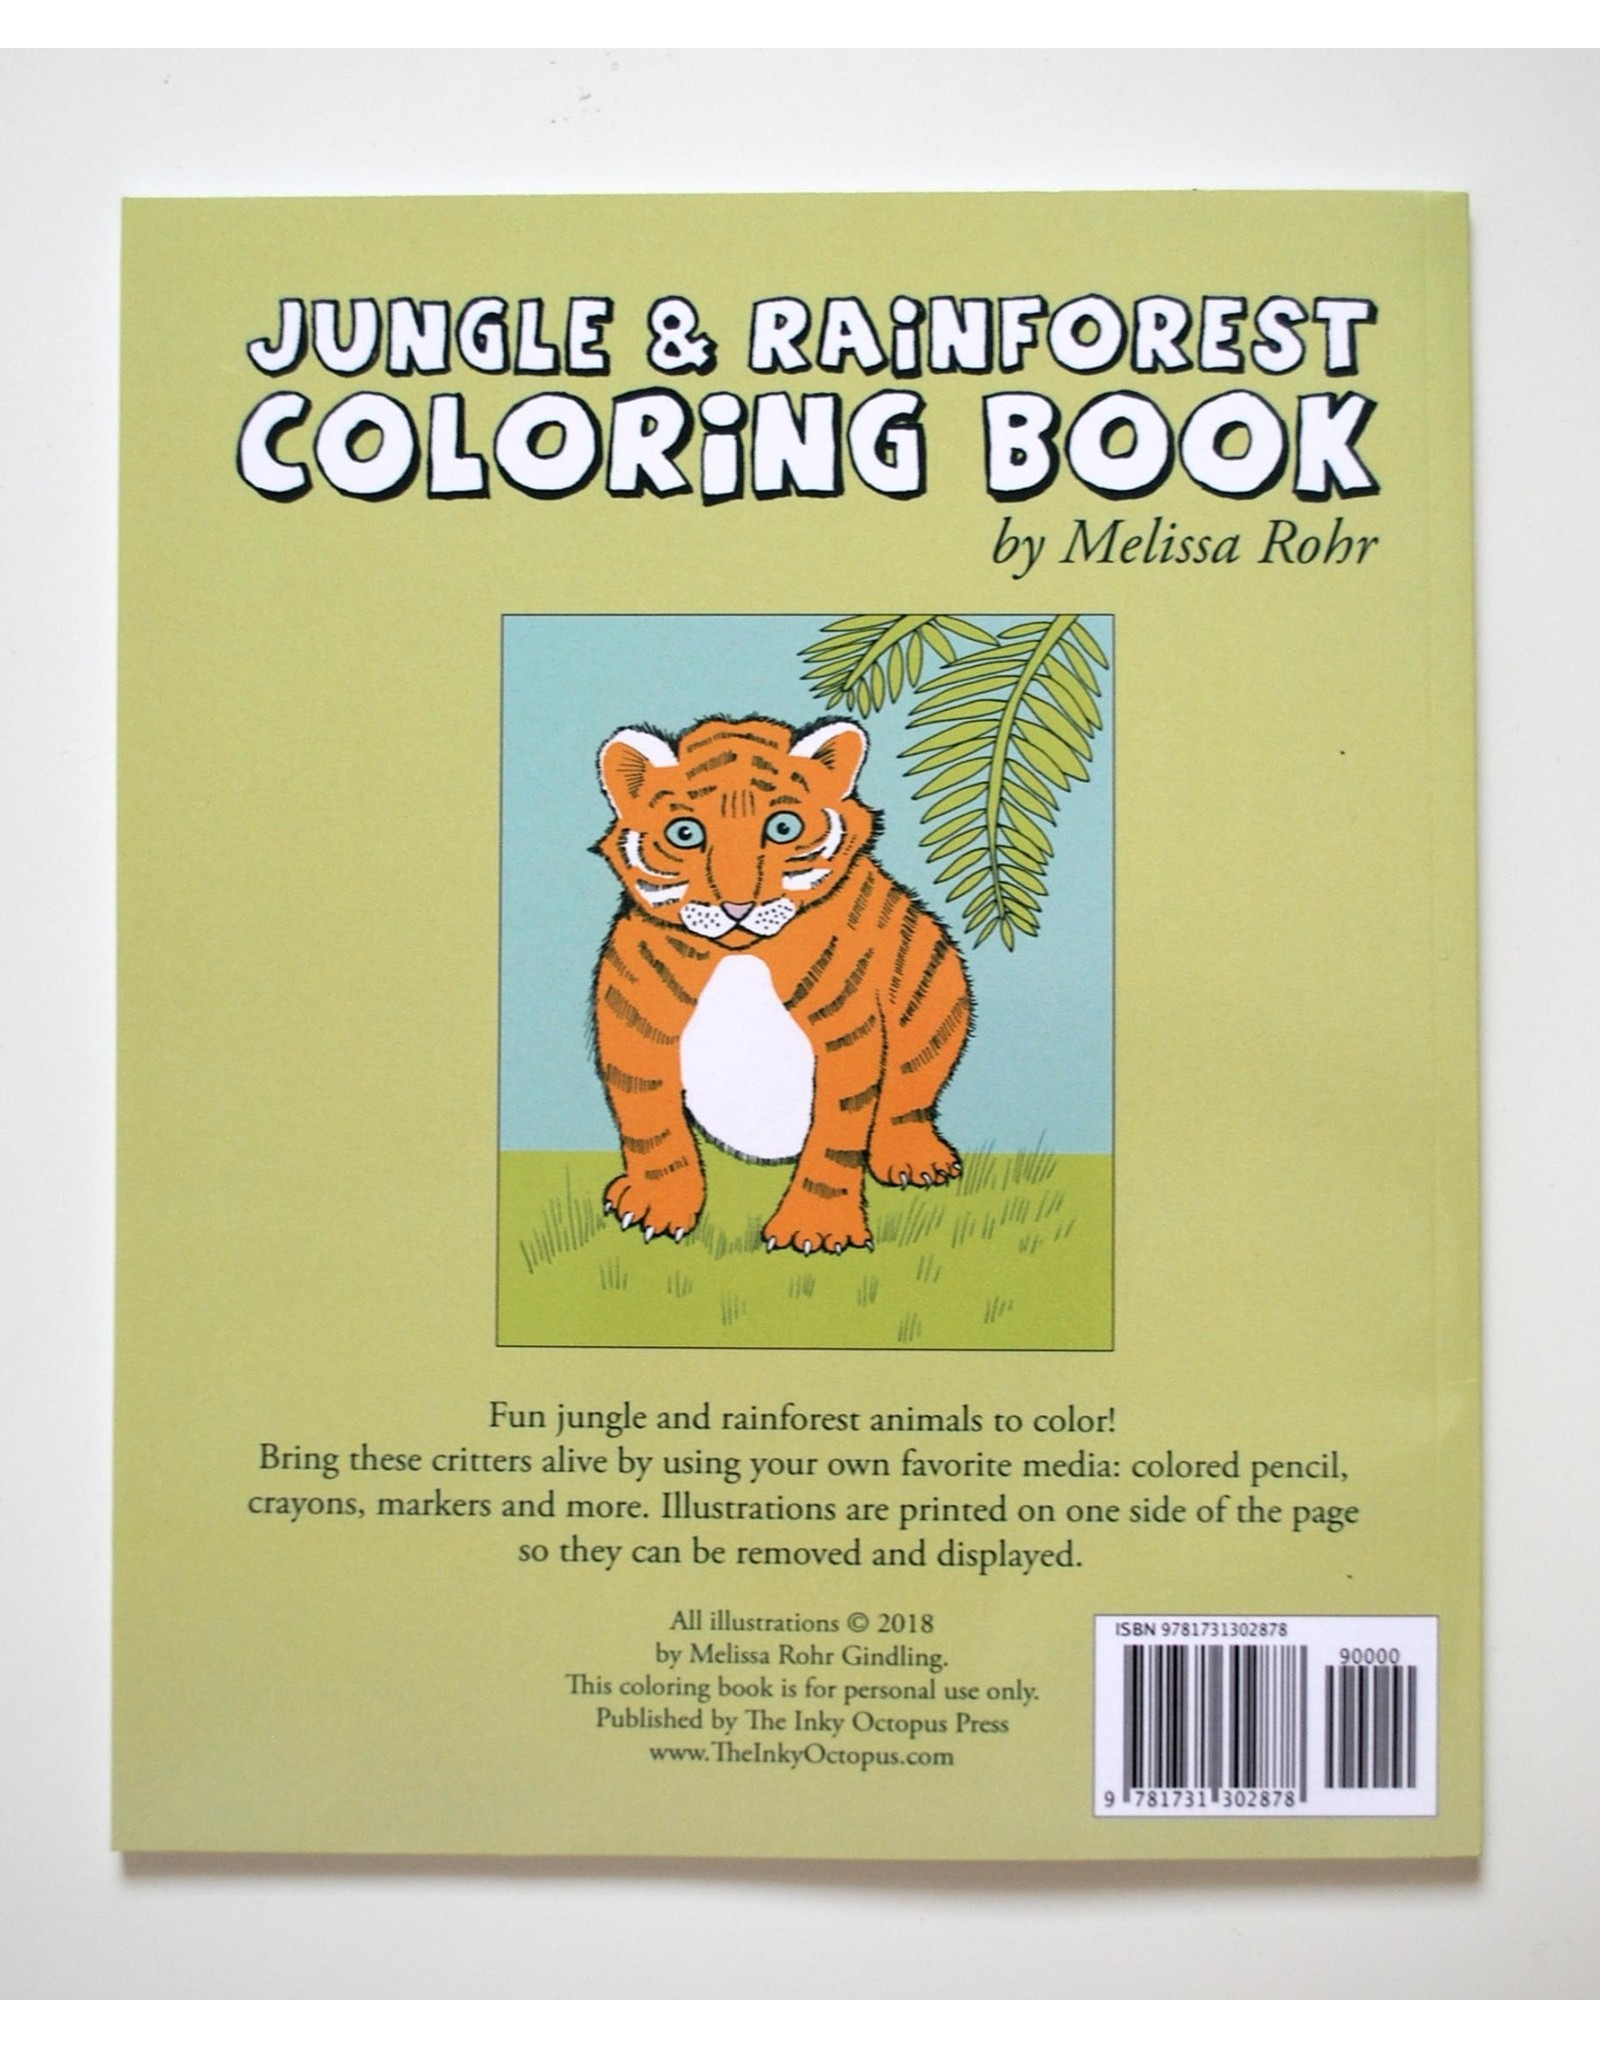 Melissa Rohr Gindling Jungle and Rainforest Coloring Book by Melissa Rohr Gindling